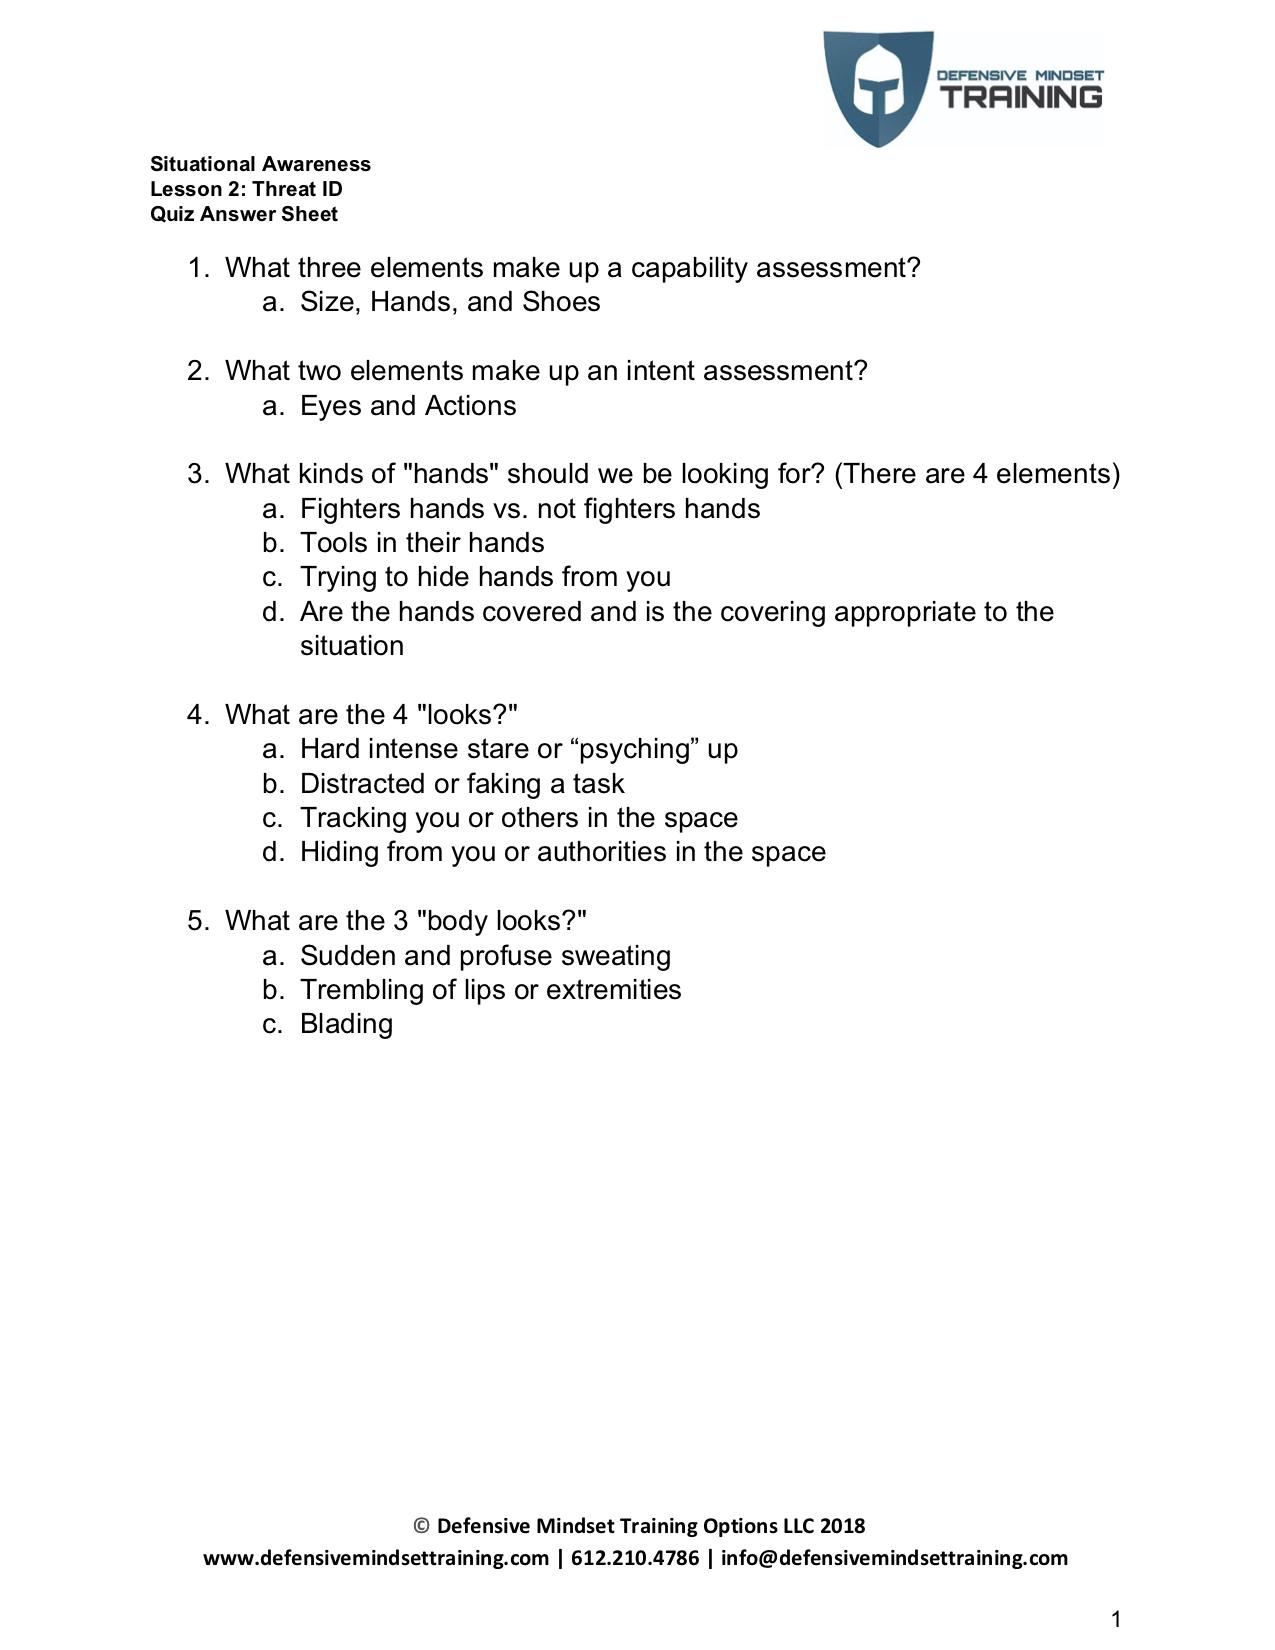 SA L2 - Threat ID - Quiz Answer Sheet.jpg